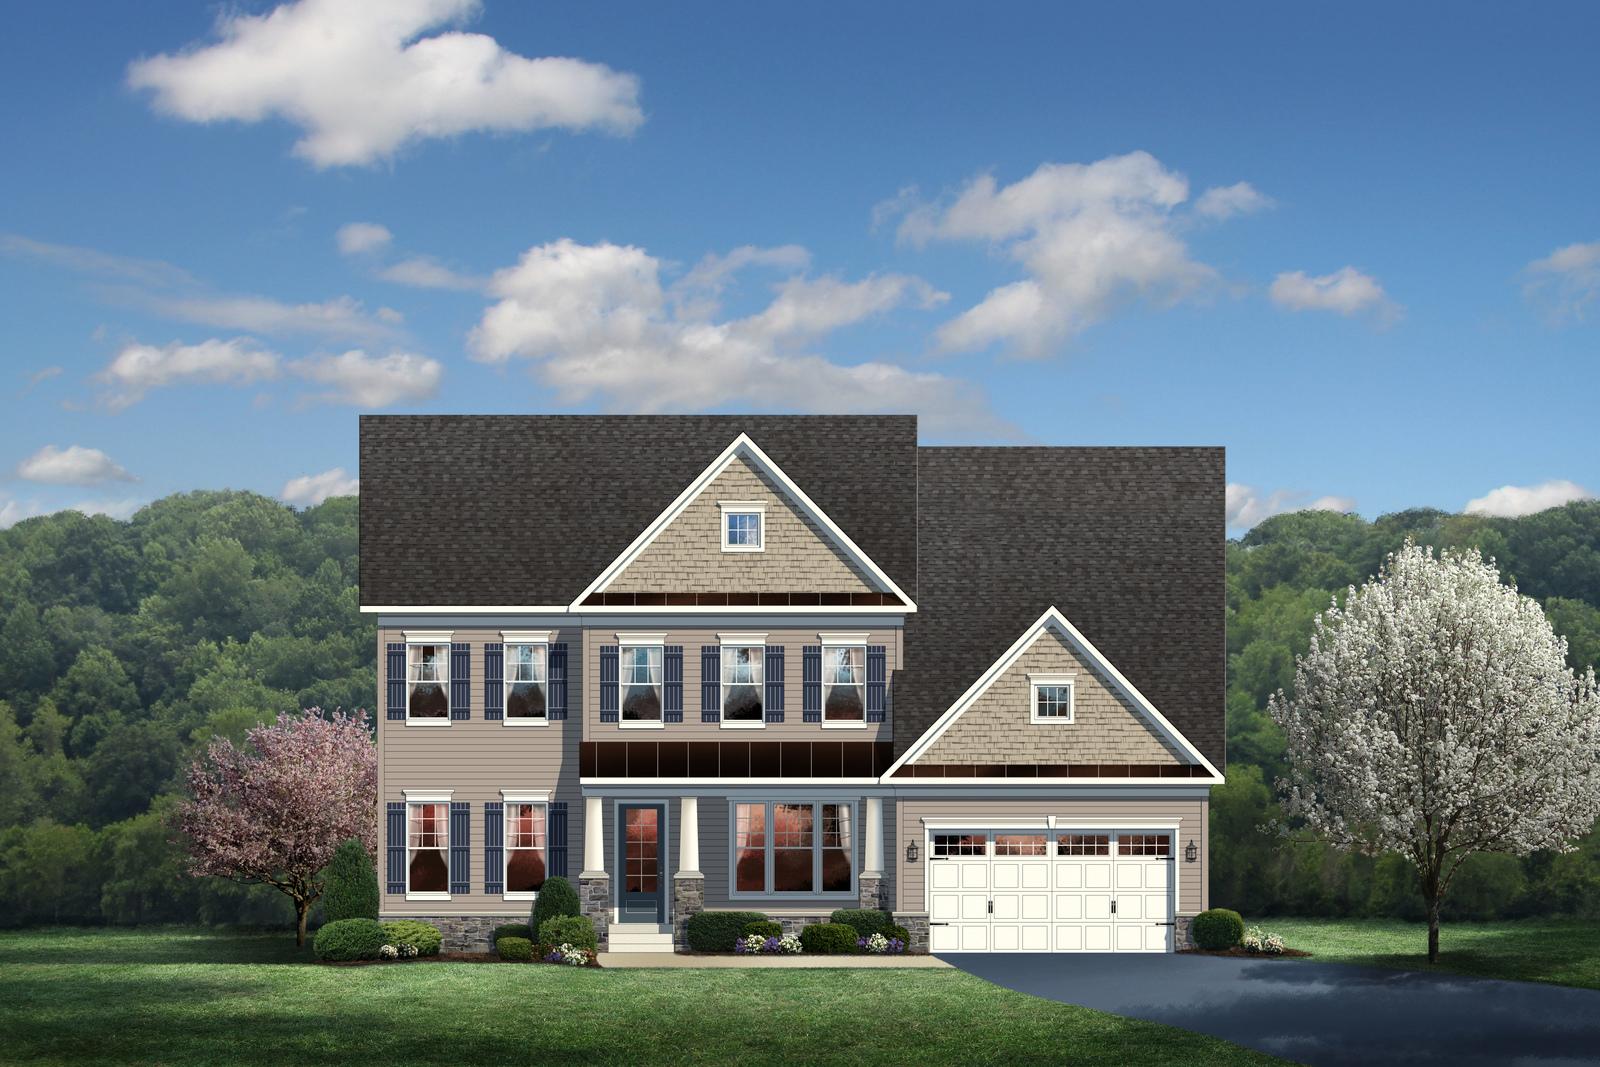 New Remington Place Ii Home Model For Sale Heartland Homes